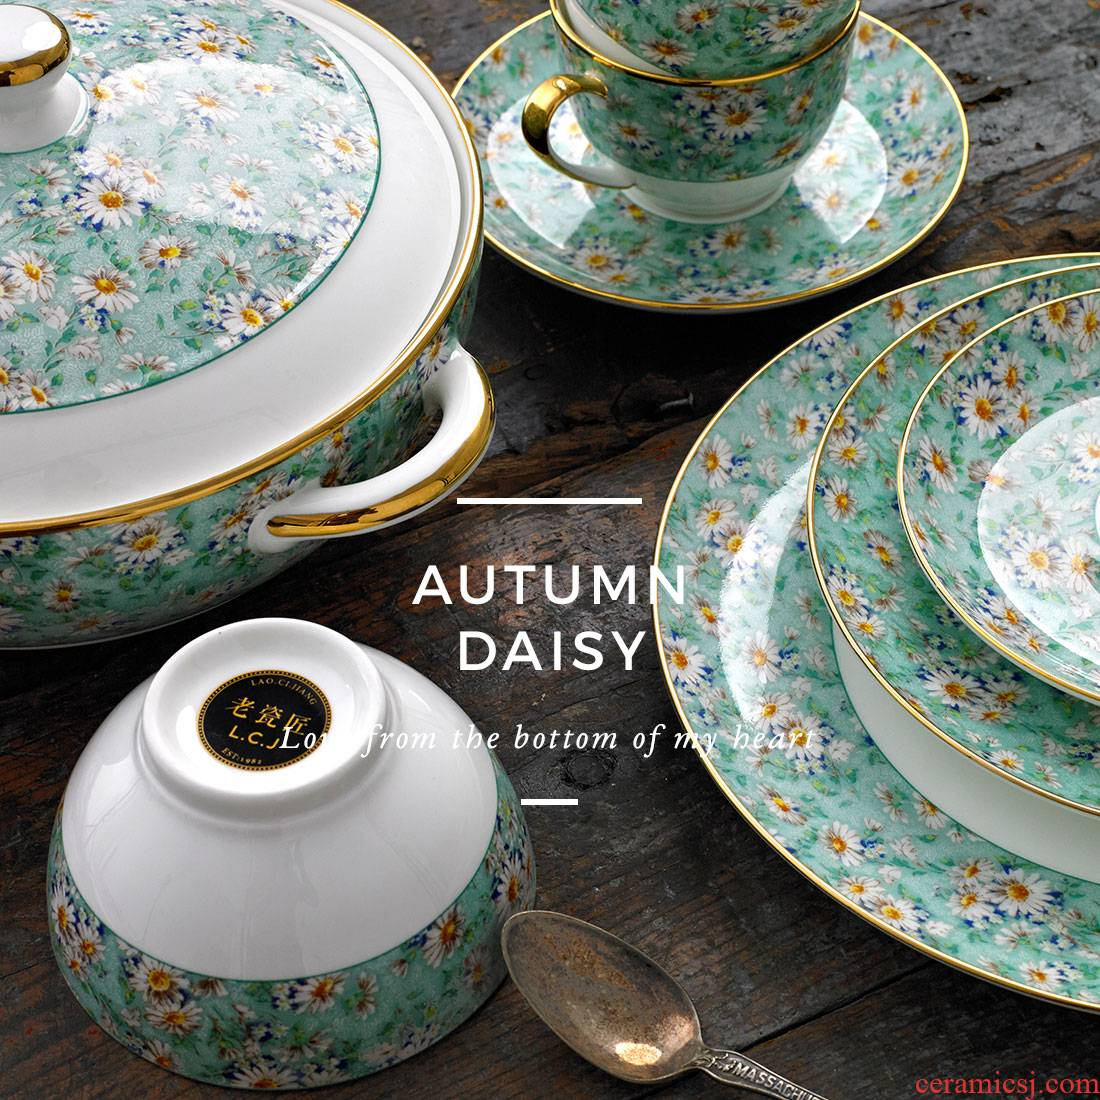 Manual paint Japanese dishes Daisy jingdezhen ceramic tableware coffee cup gift set tableware DIY custom